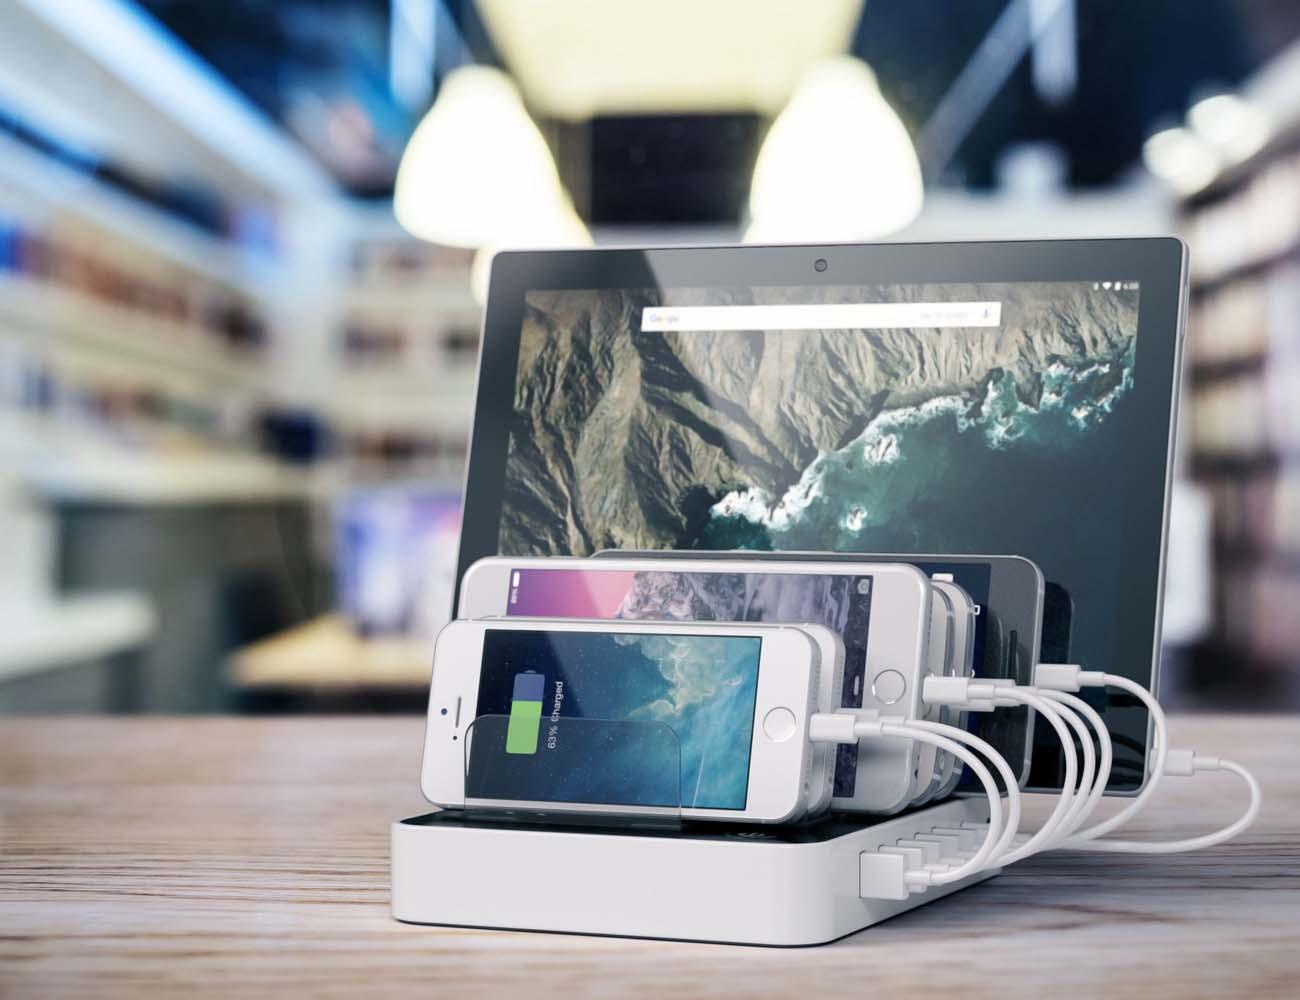 Satechi 7-Port USB Charging Station Dock